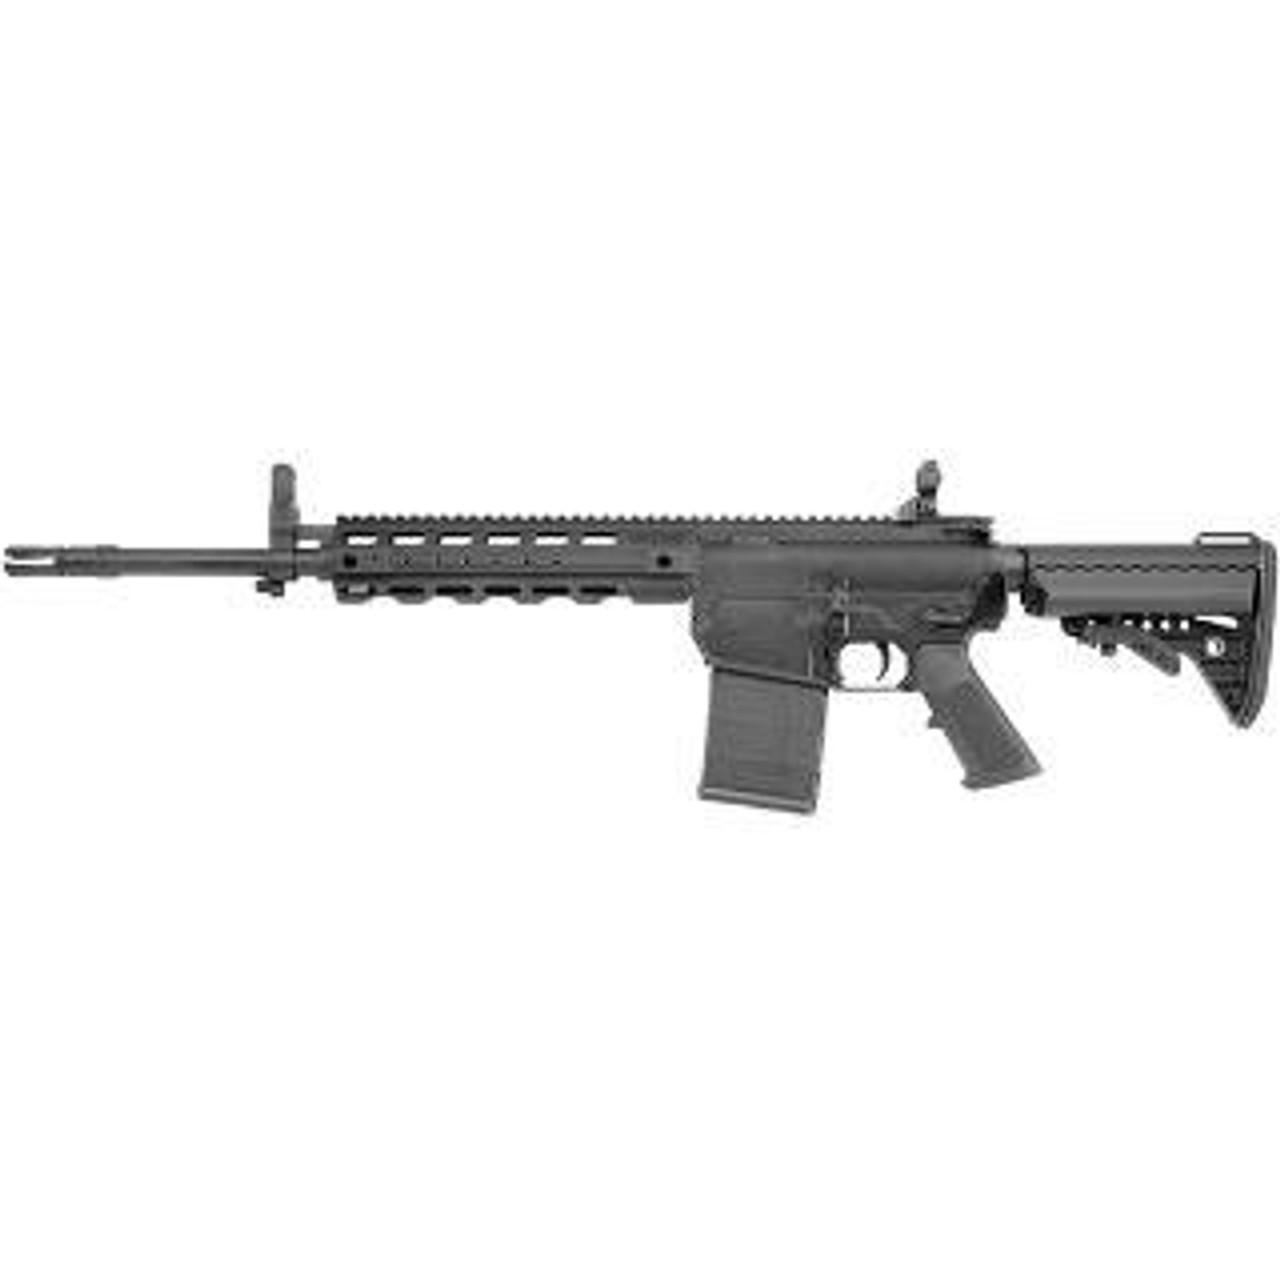 Colt MARC 901 CALIFORNIA LEGAL - .308/7.62x51